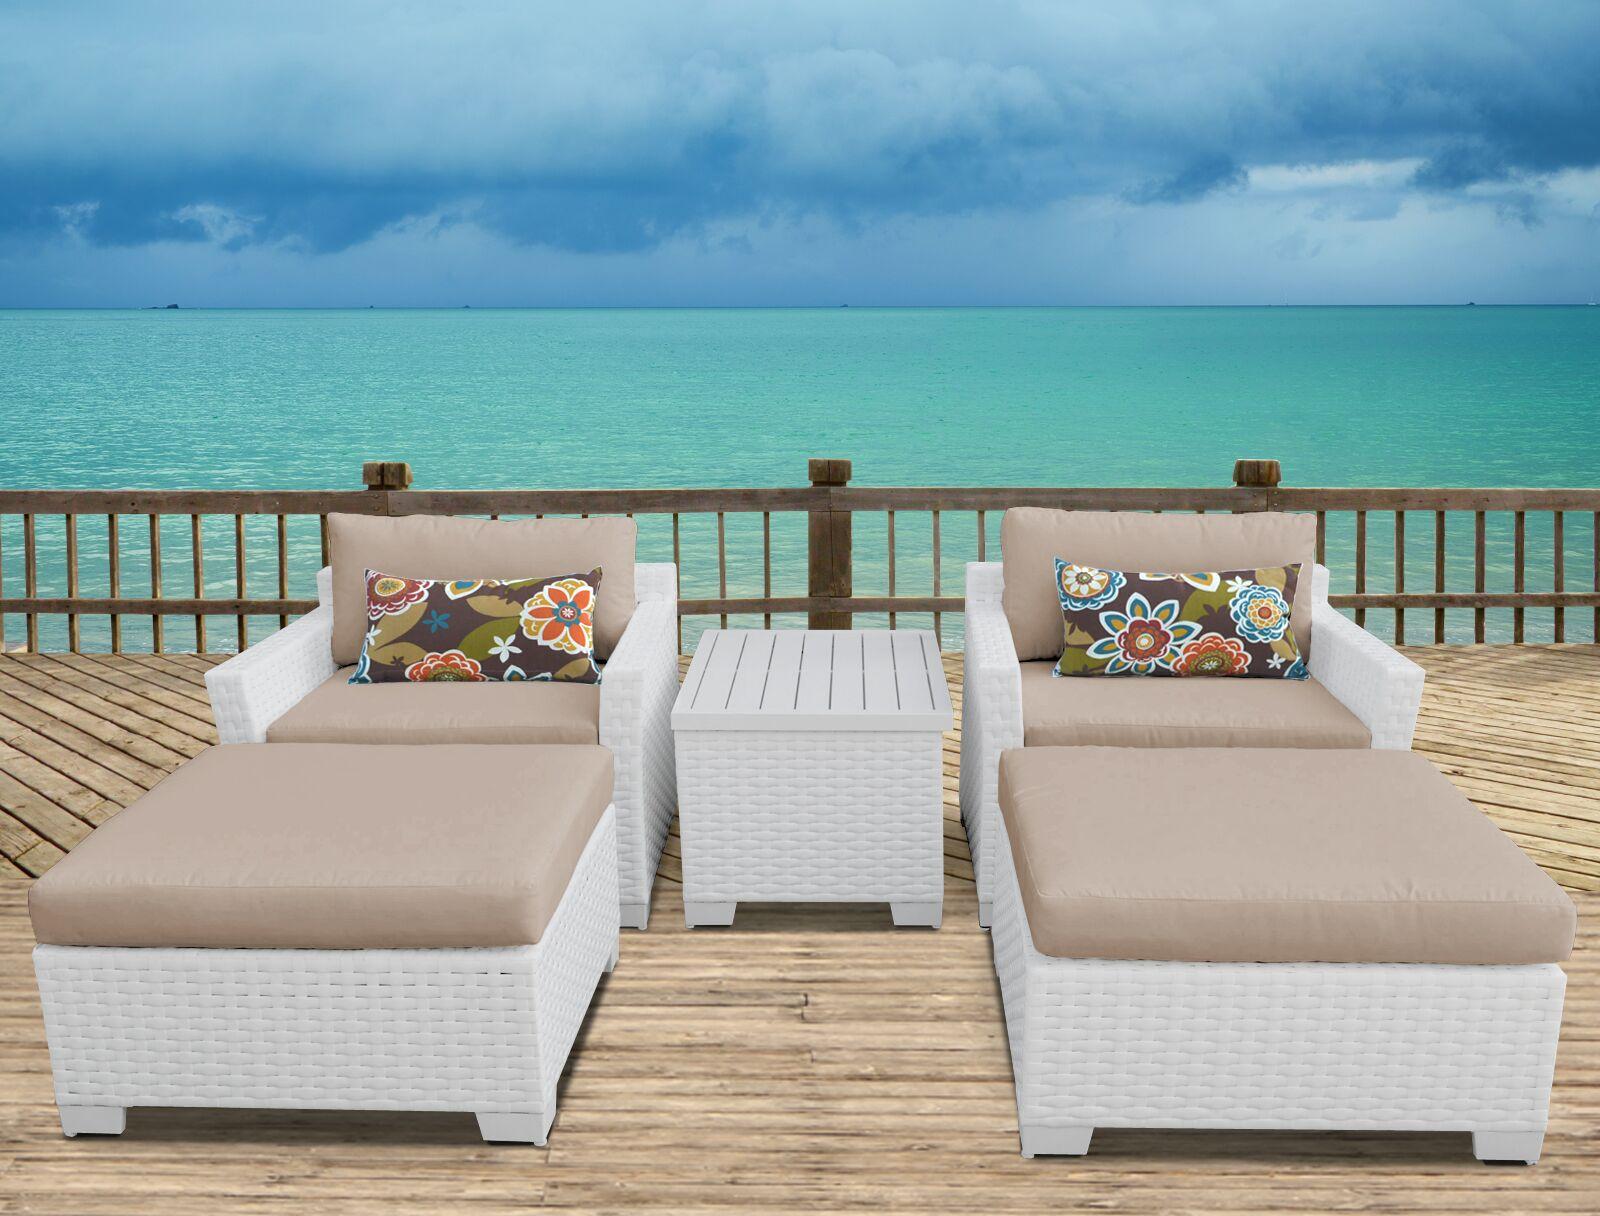 Monaco 5 Piece Conversation Set with Cushions Cushion Color (Fabric): Wheat